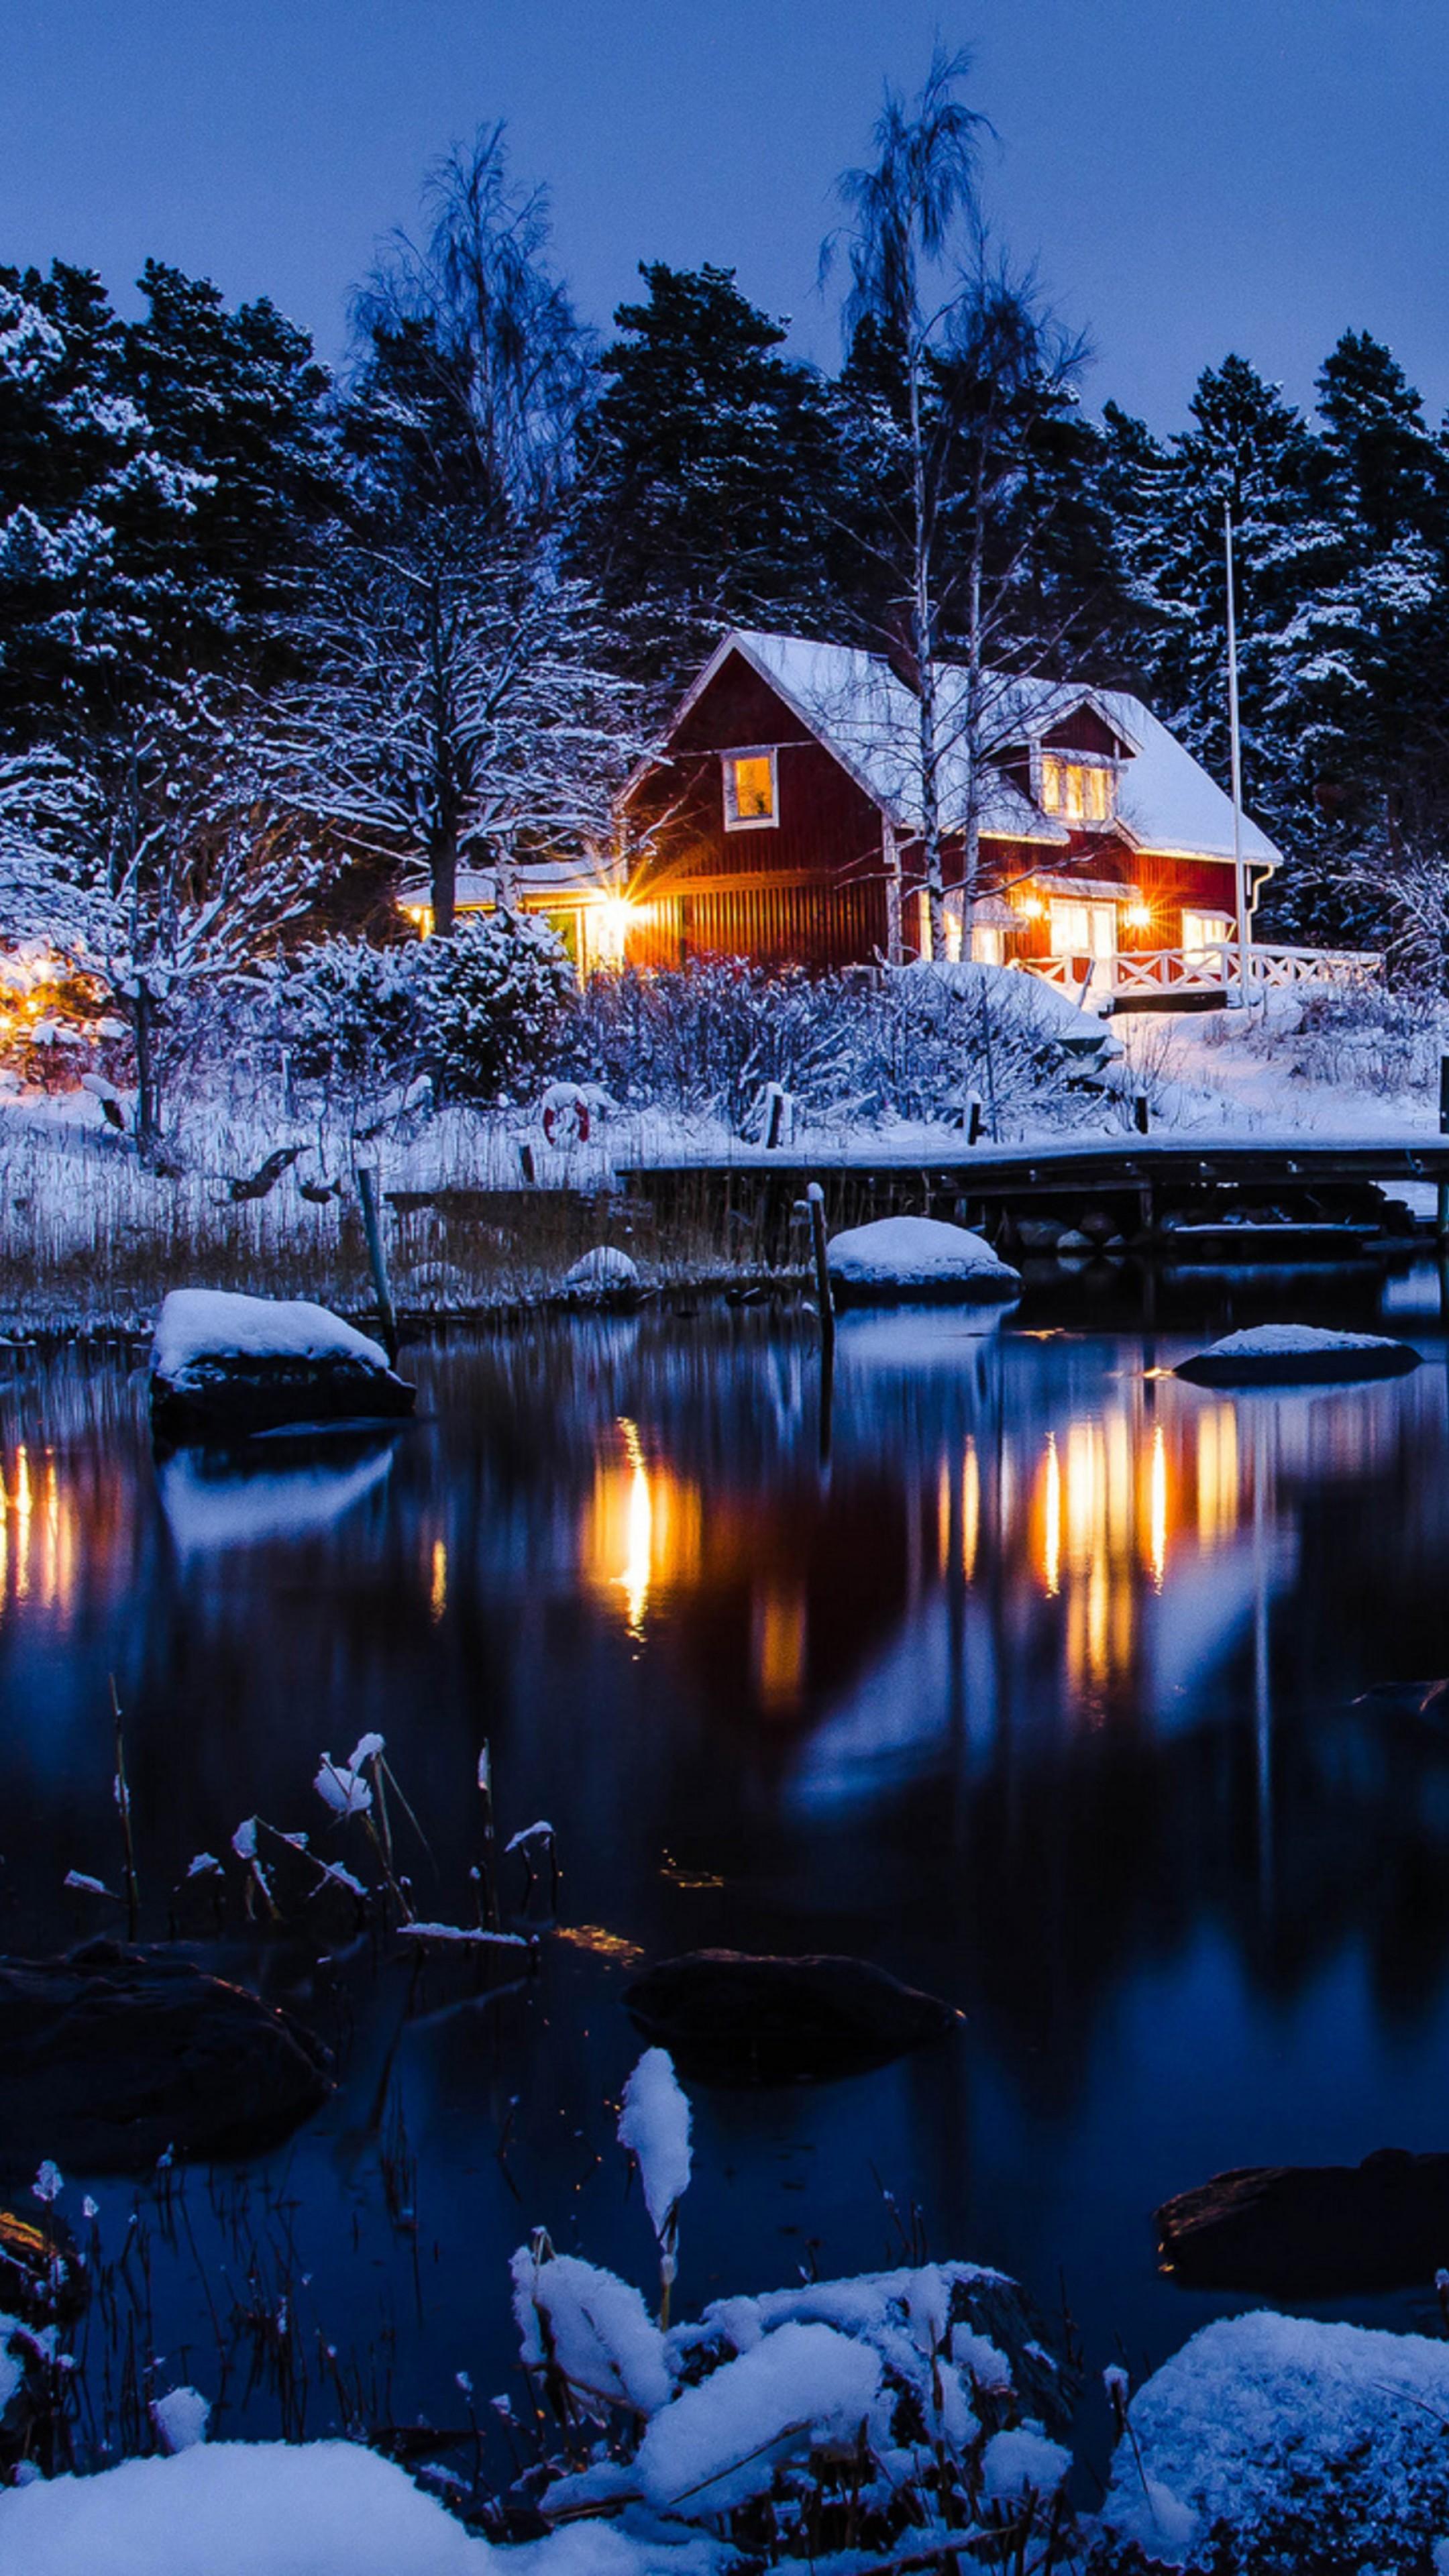 Christmas Snow Wallpaper Hd Wallpaper House Lake Trees Winter 5k Nature 17375